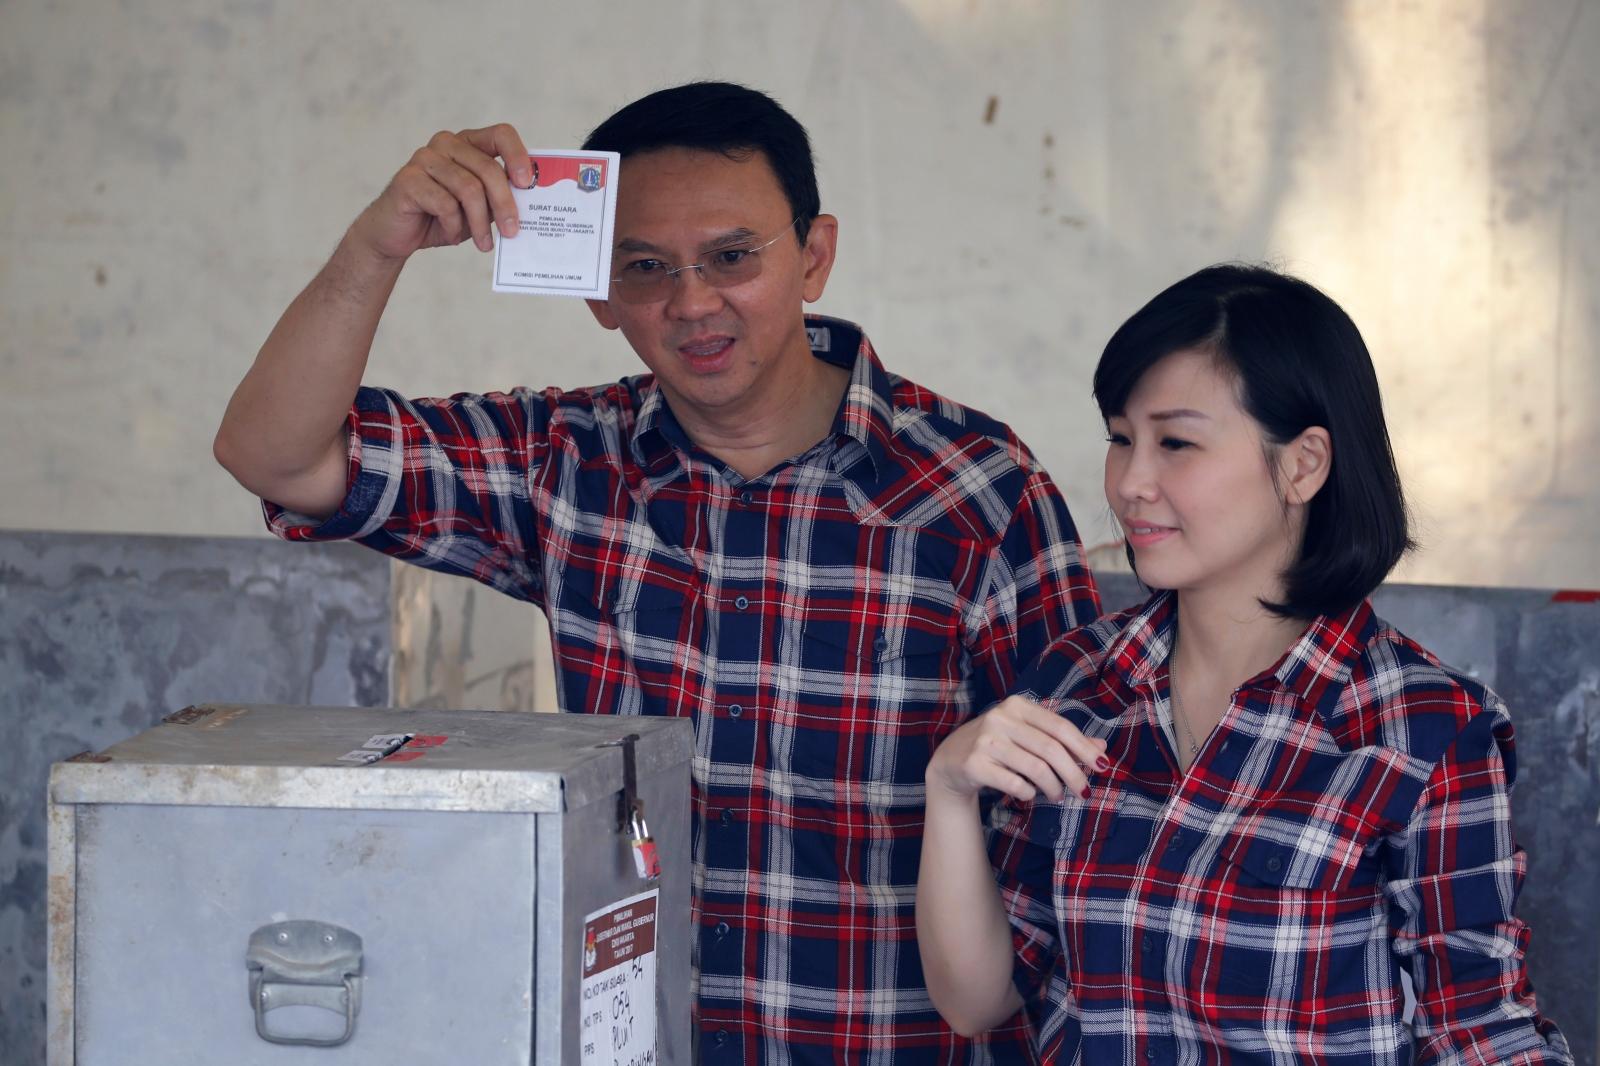 Indonesia court delays Jakarta governor Ahok's blasphemy